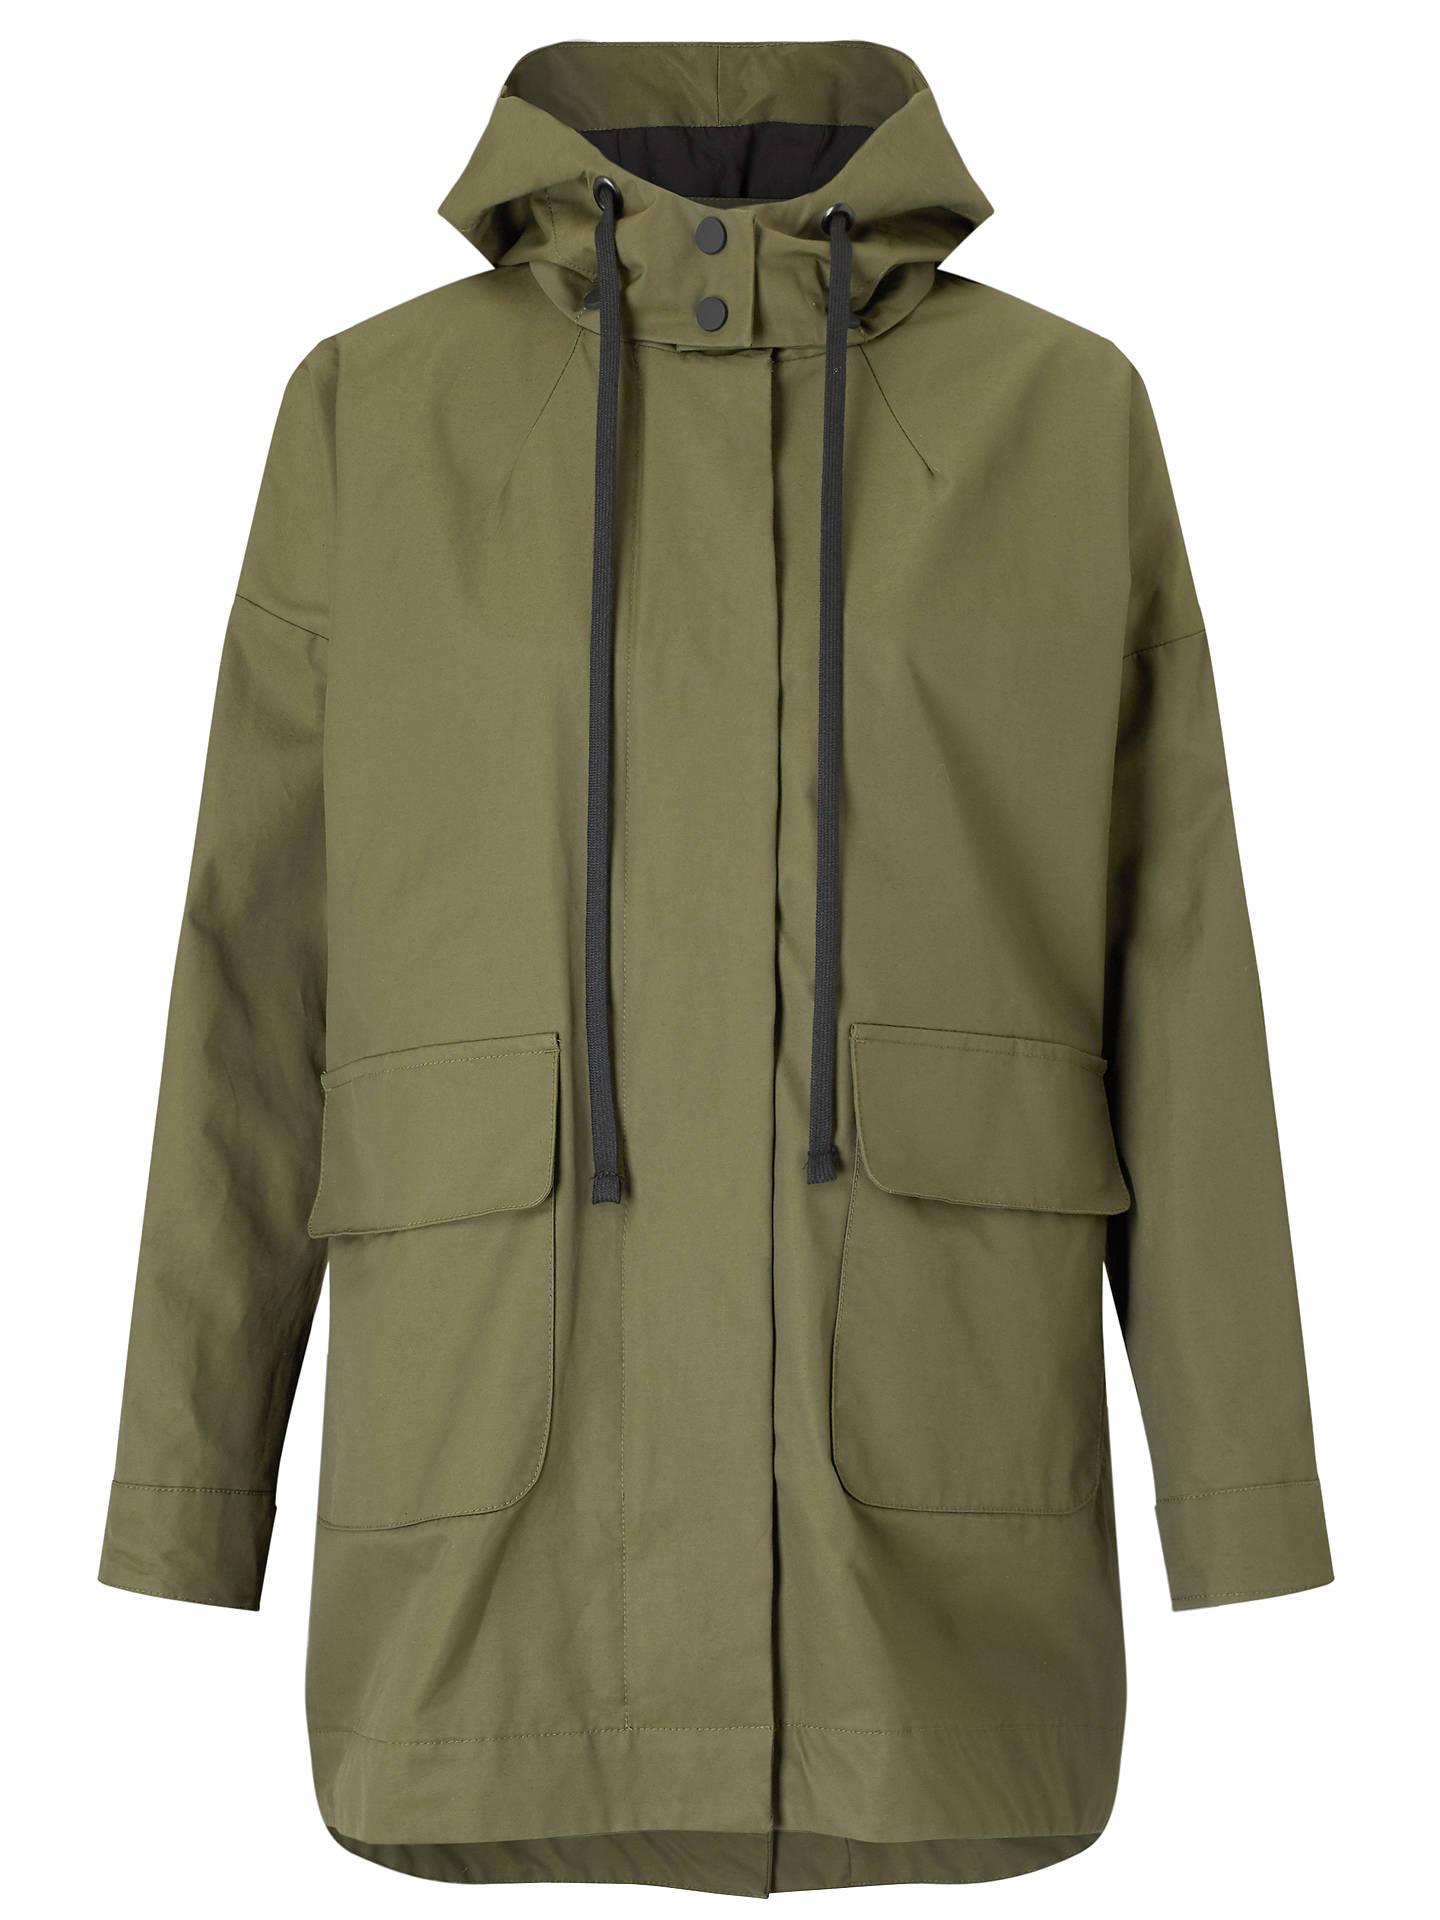 5db7b17dcf9 Kin by John Lewis Parka Coat, Khaki at John Lewis & Partners